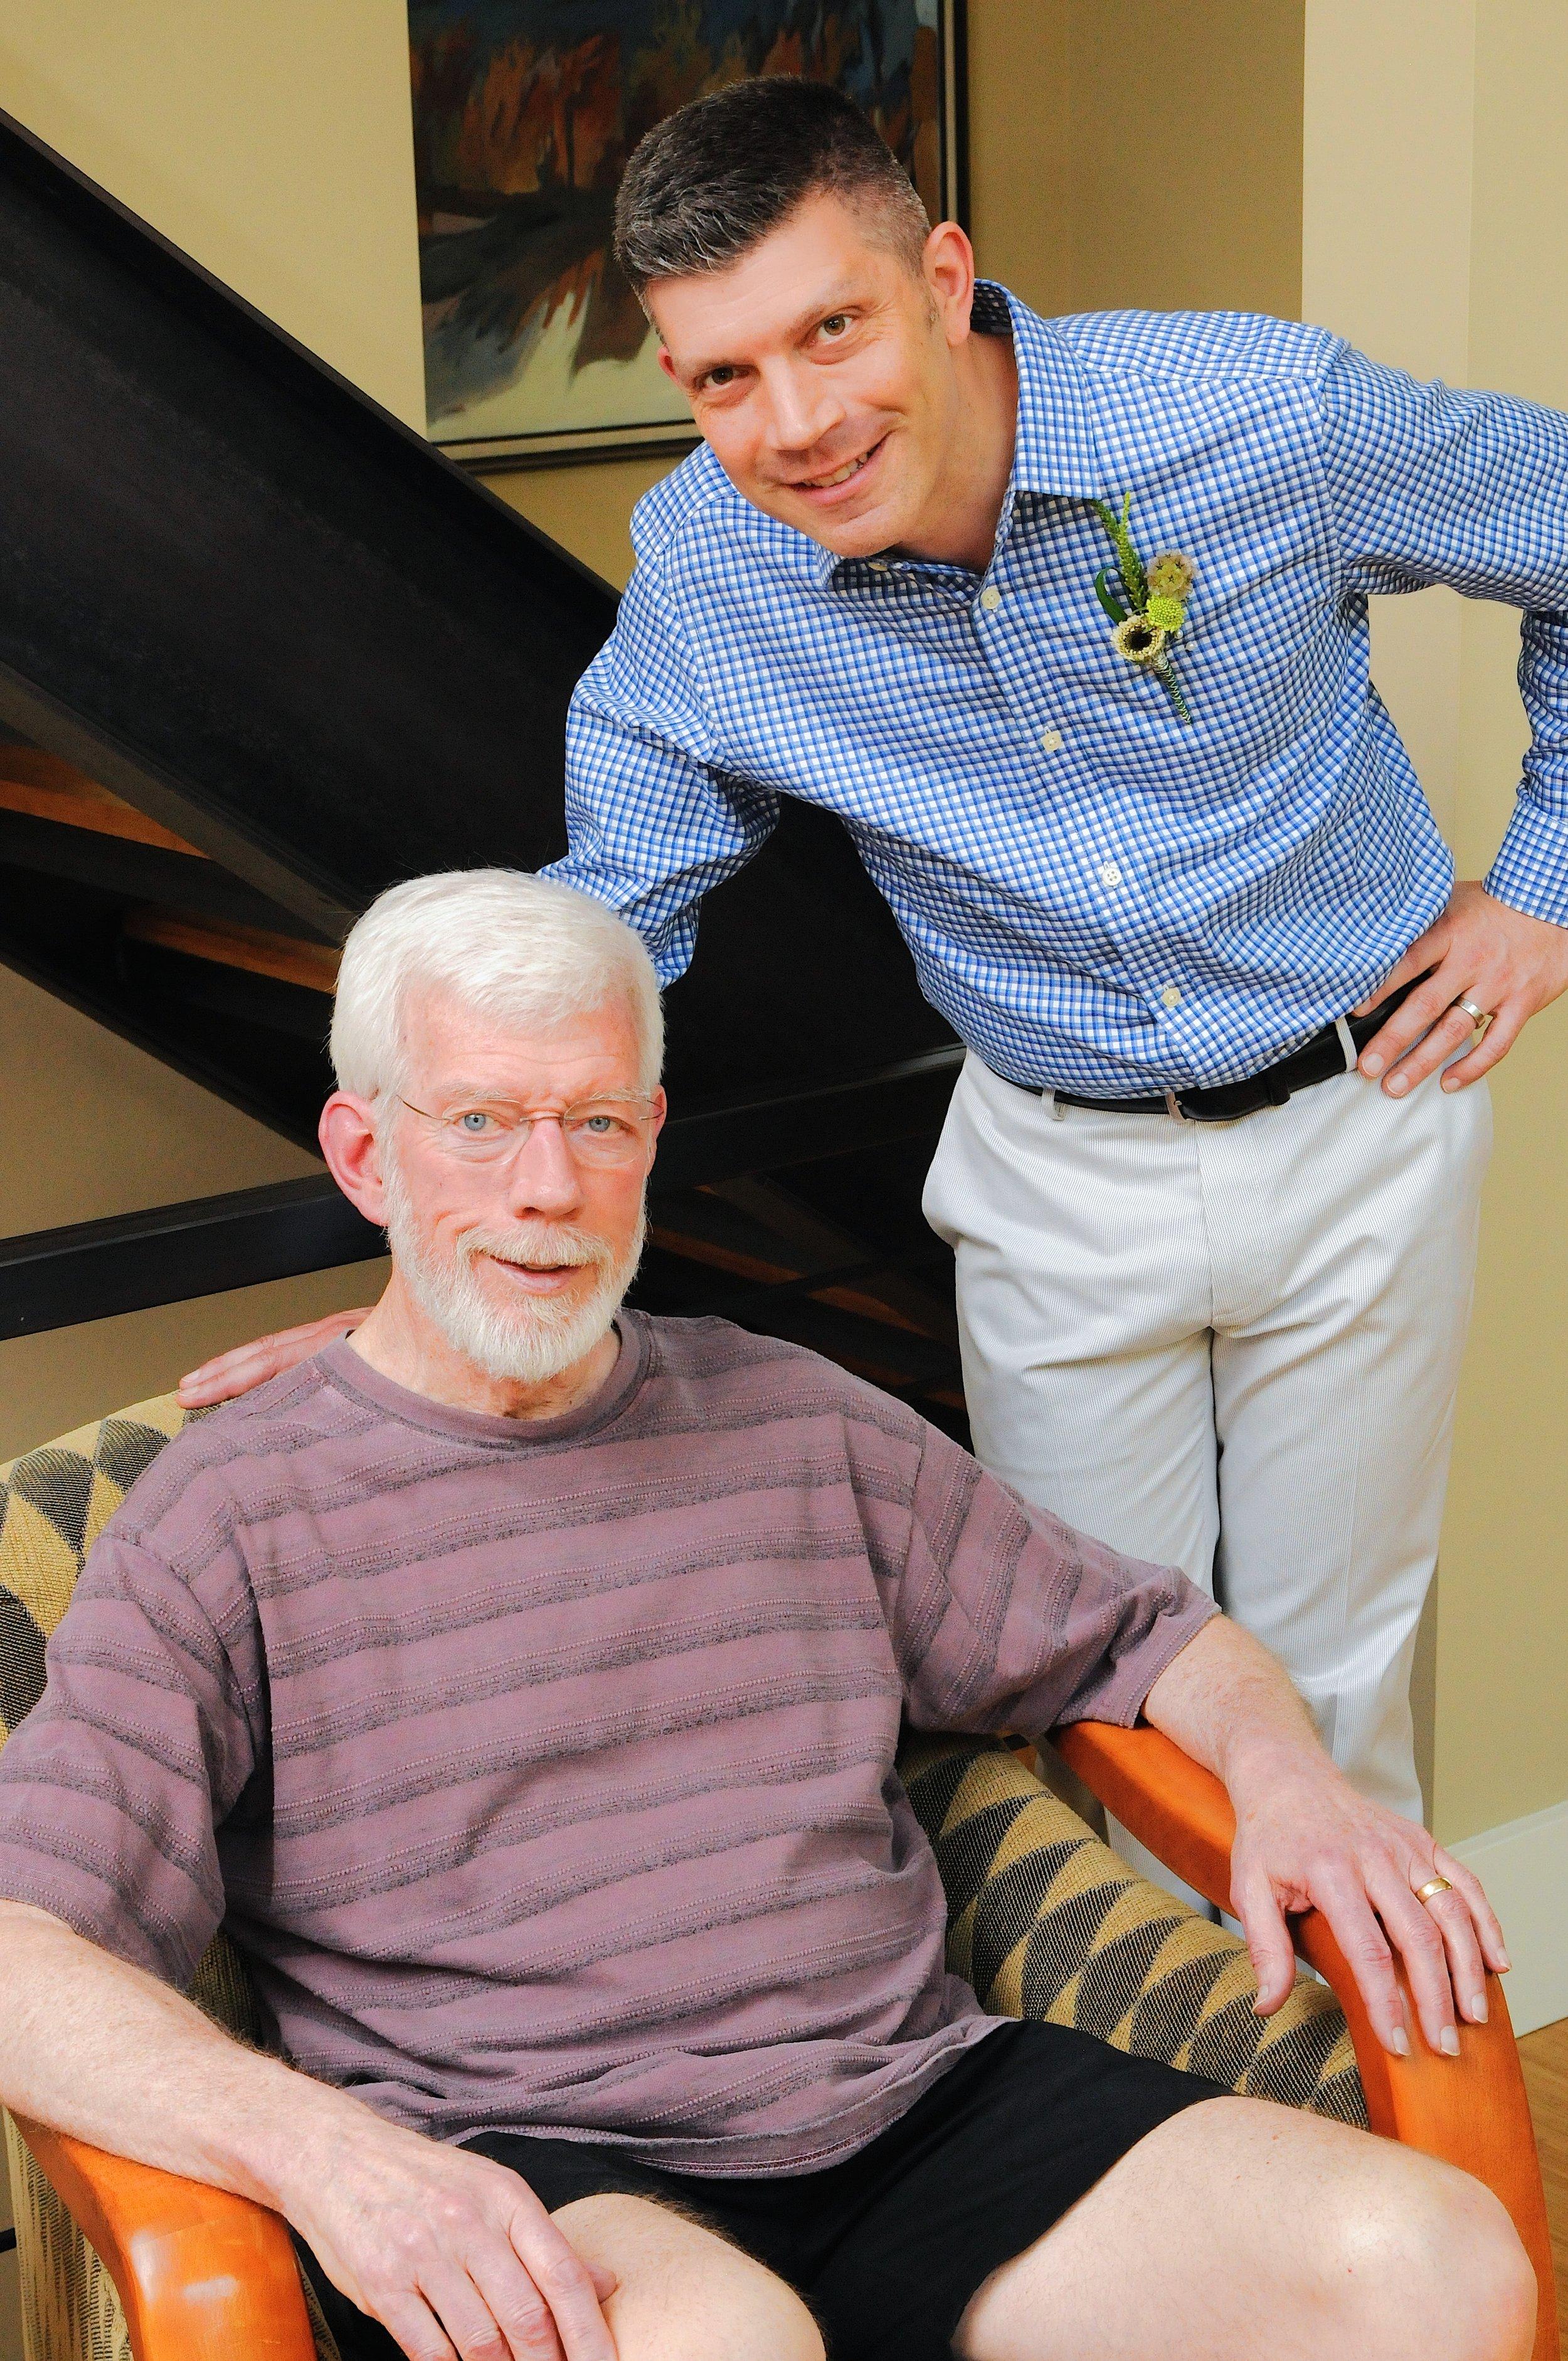 David and John